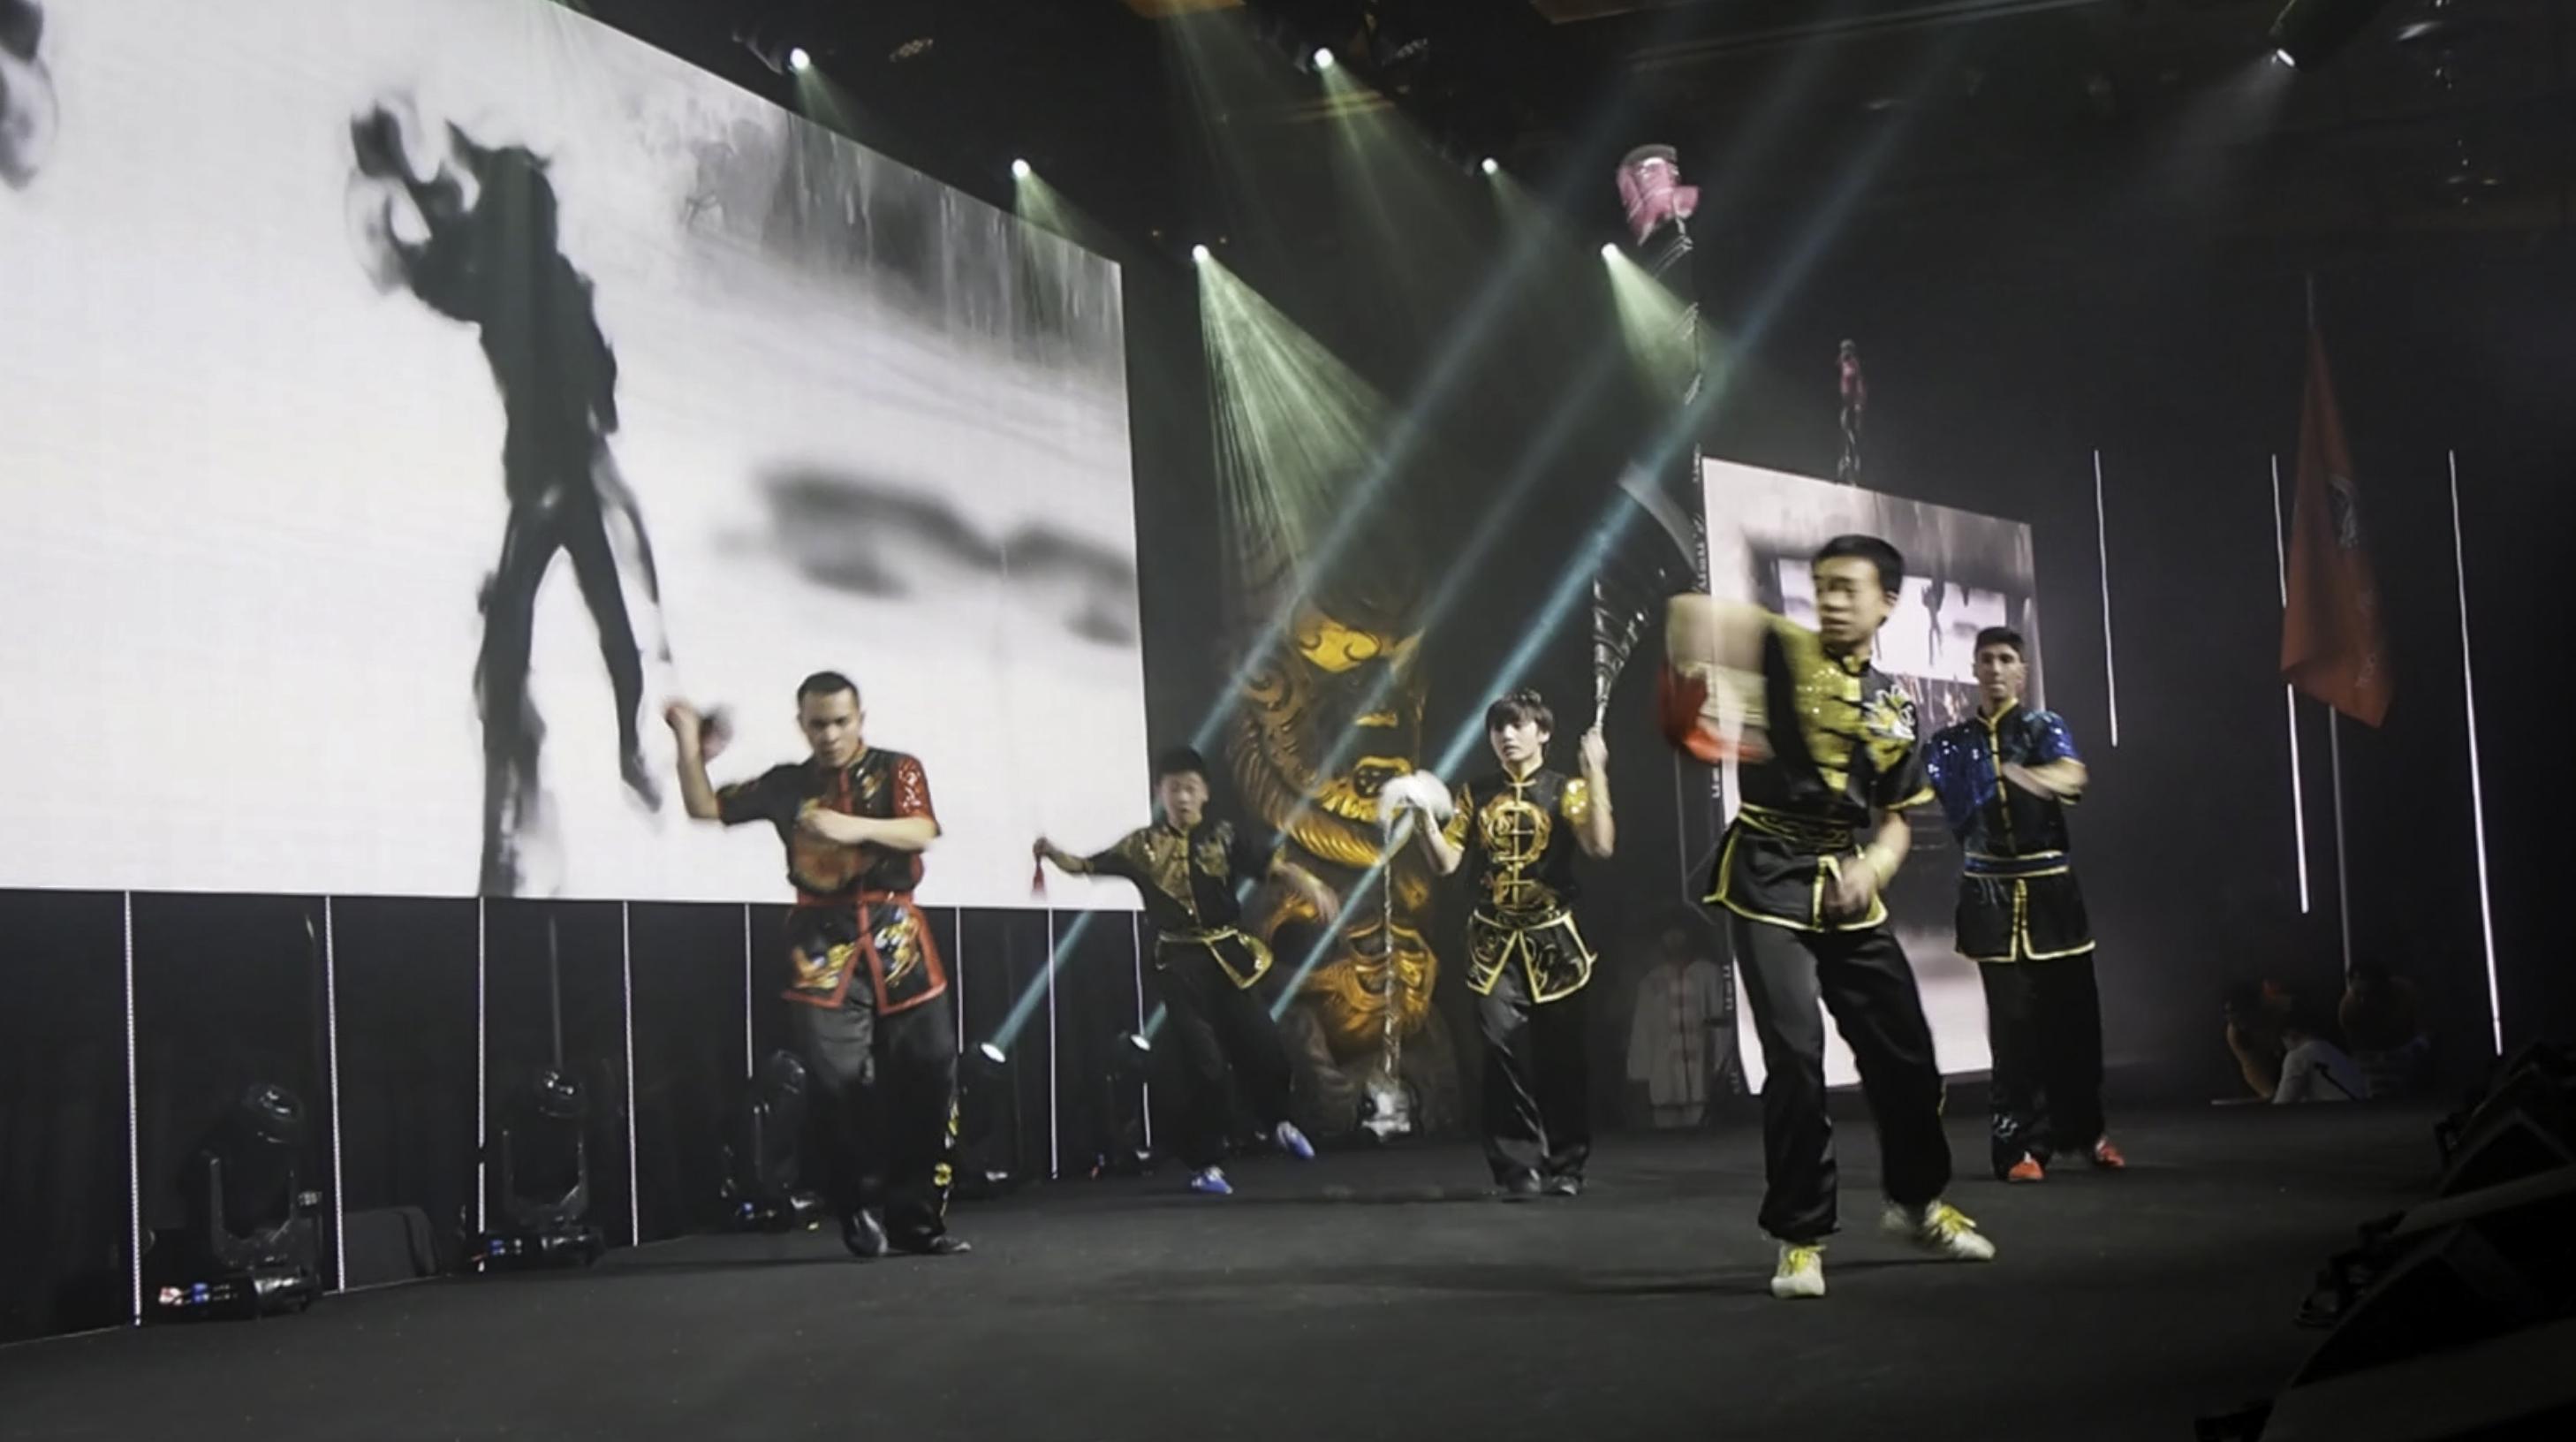 Group Chain Whip Performance Wushu